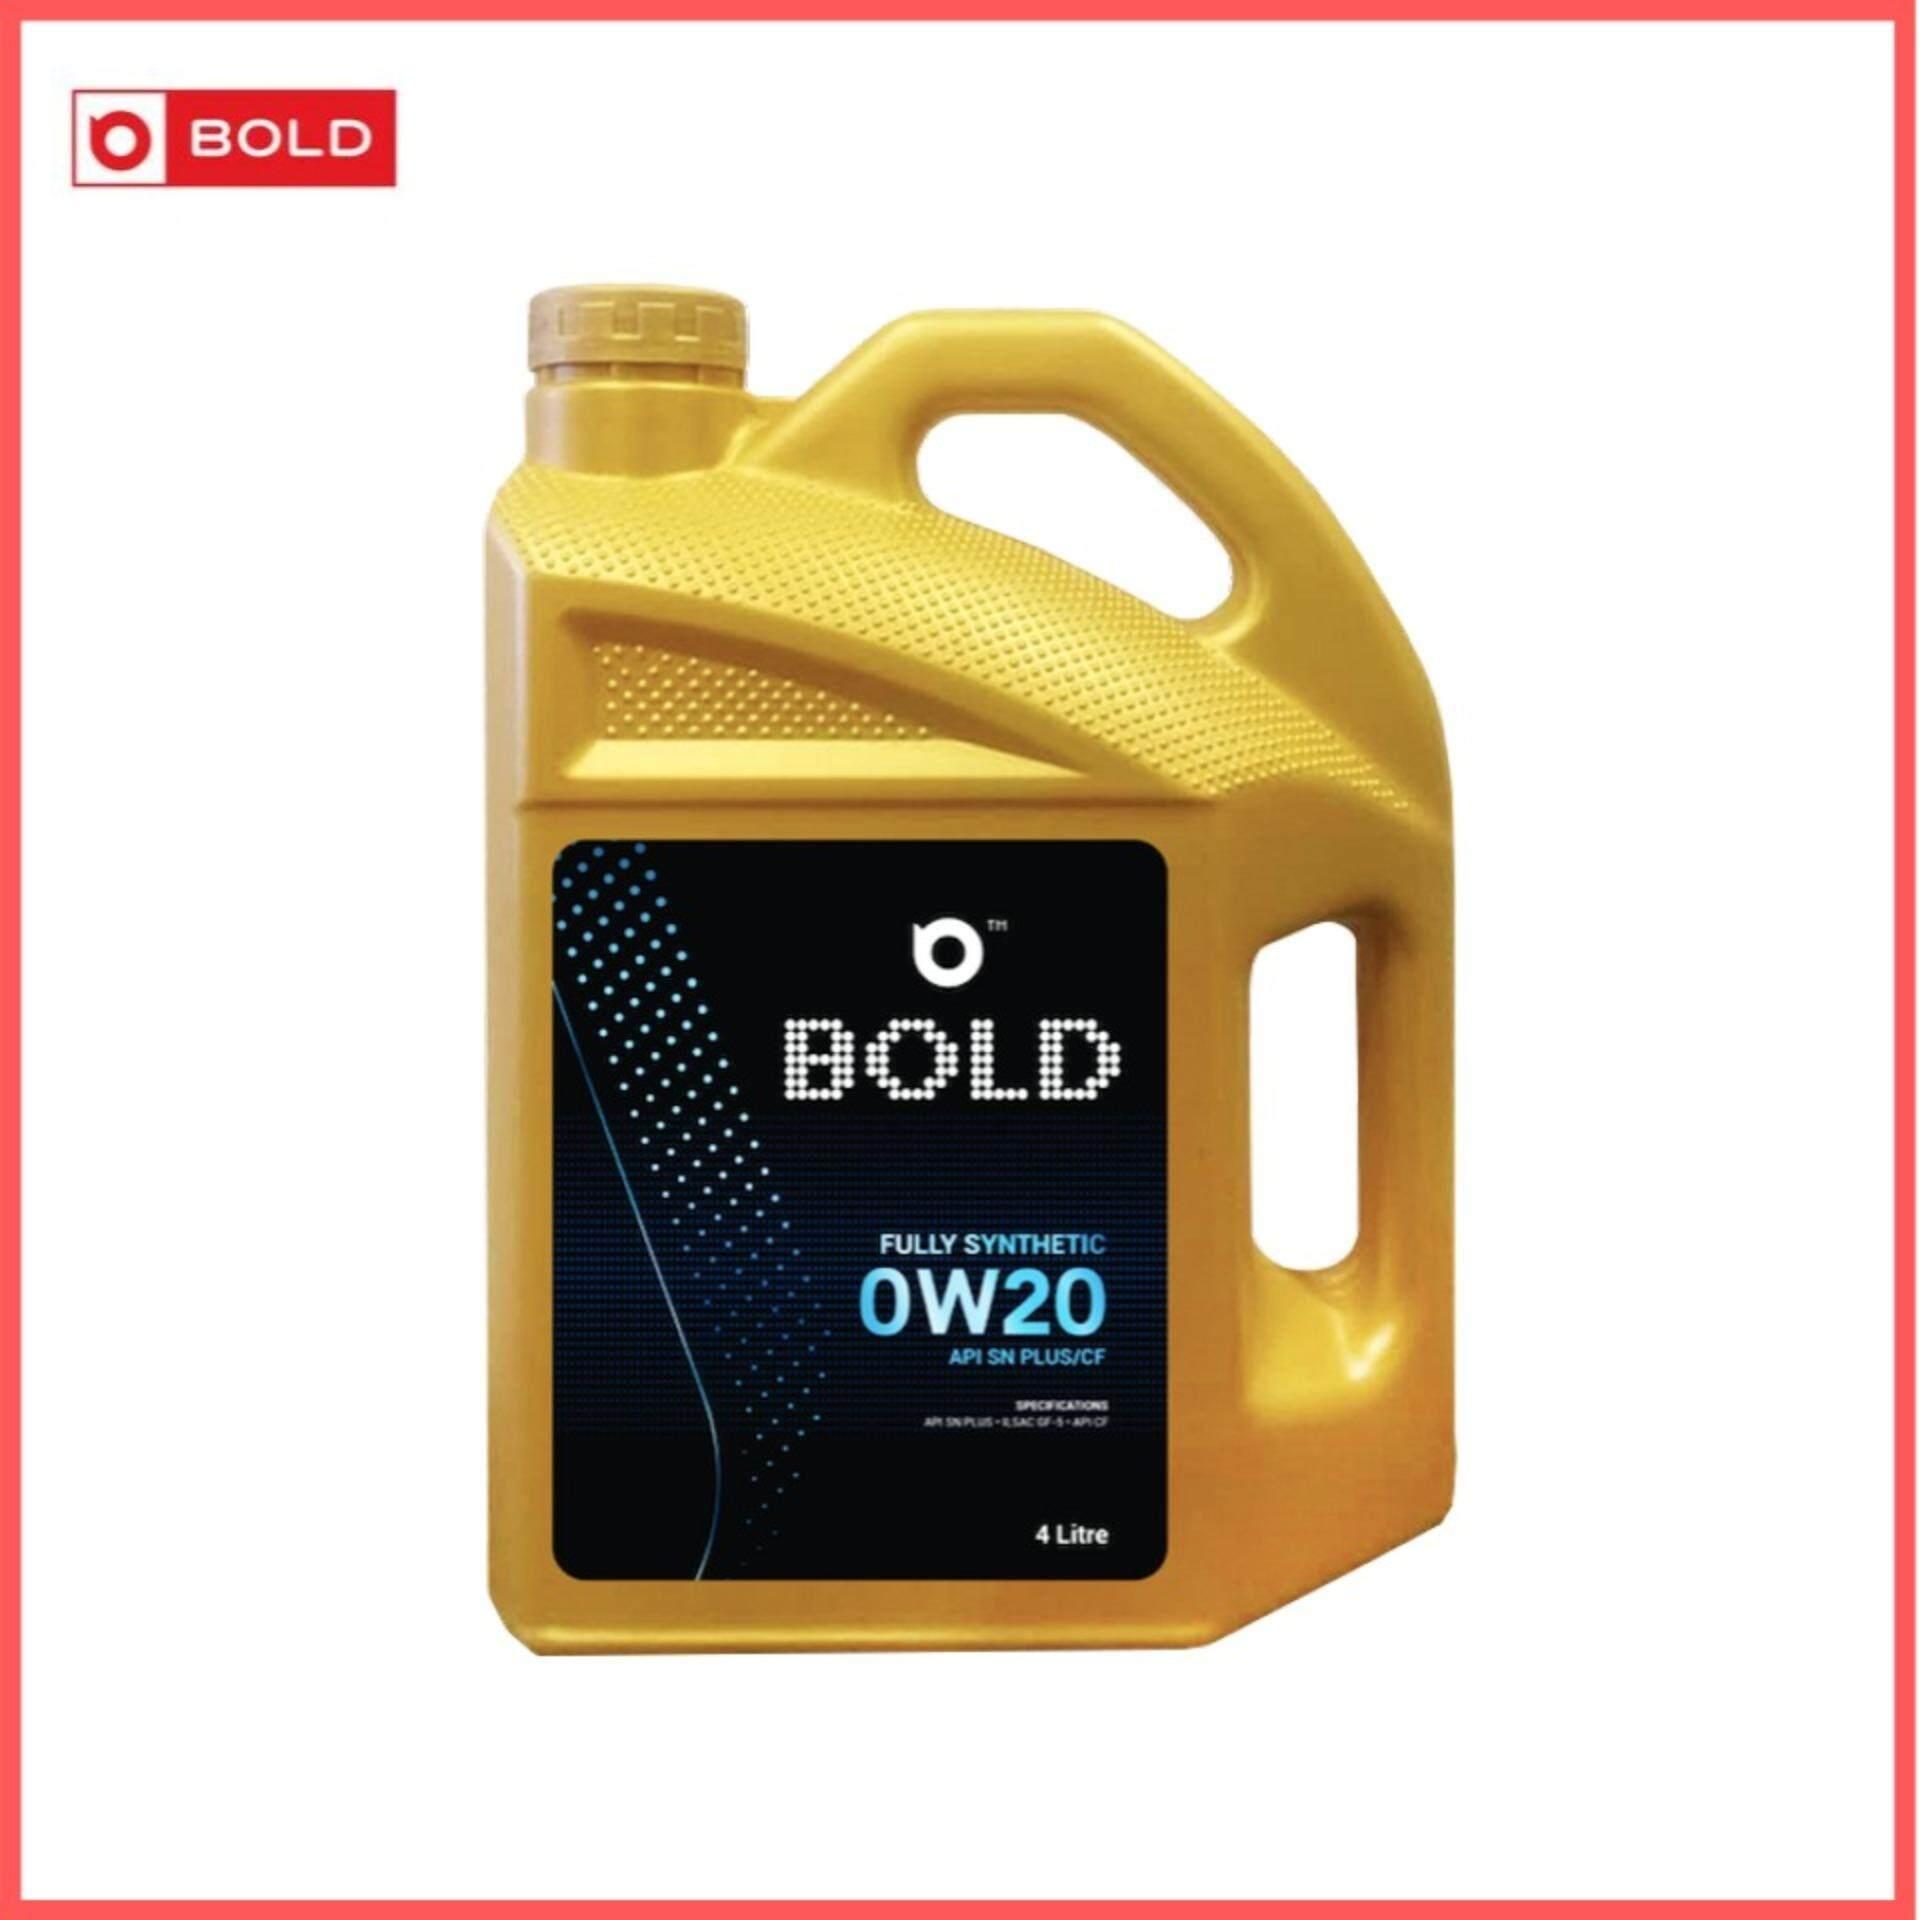 Bold Fully Synthetic SN Plus 0w20 Engine Oil Lubricant 0w-20 4L / 4Litre Minyak Hitam Minyak Enjin Kereta Proton / Nissan / Toyota / Honda / Perodua